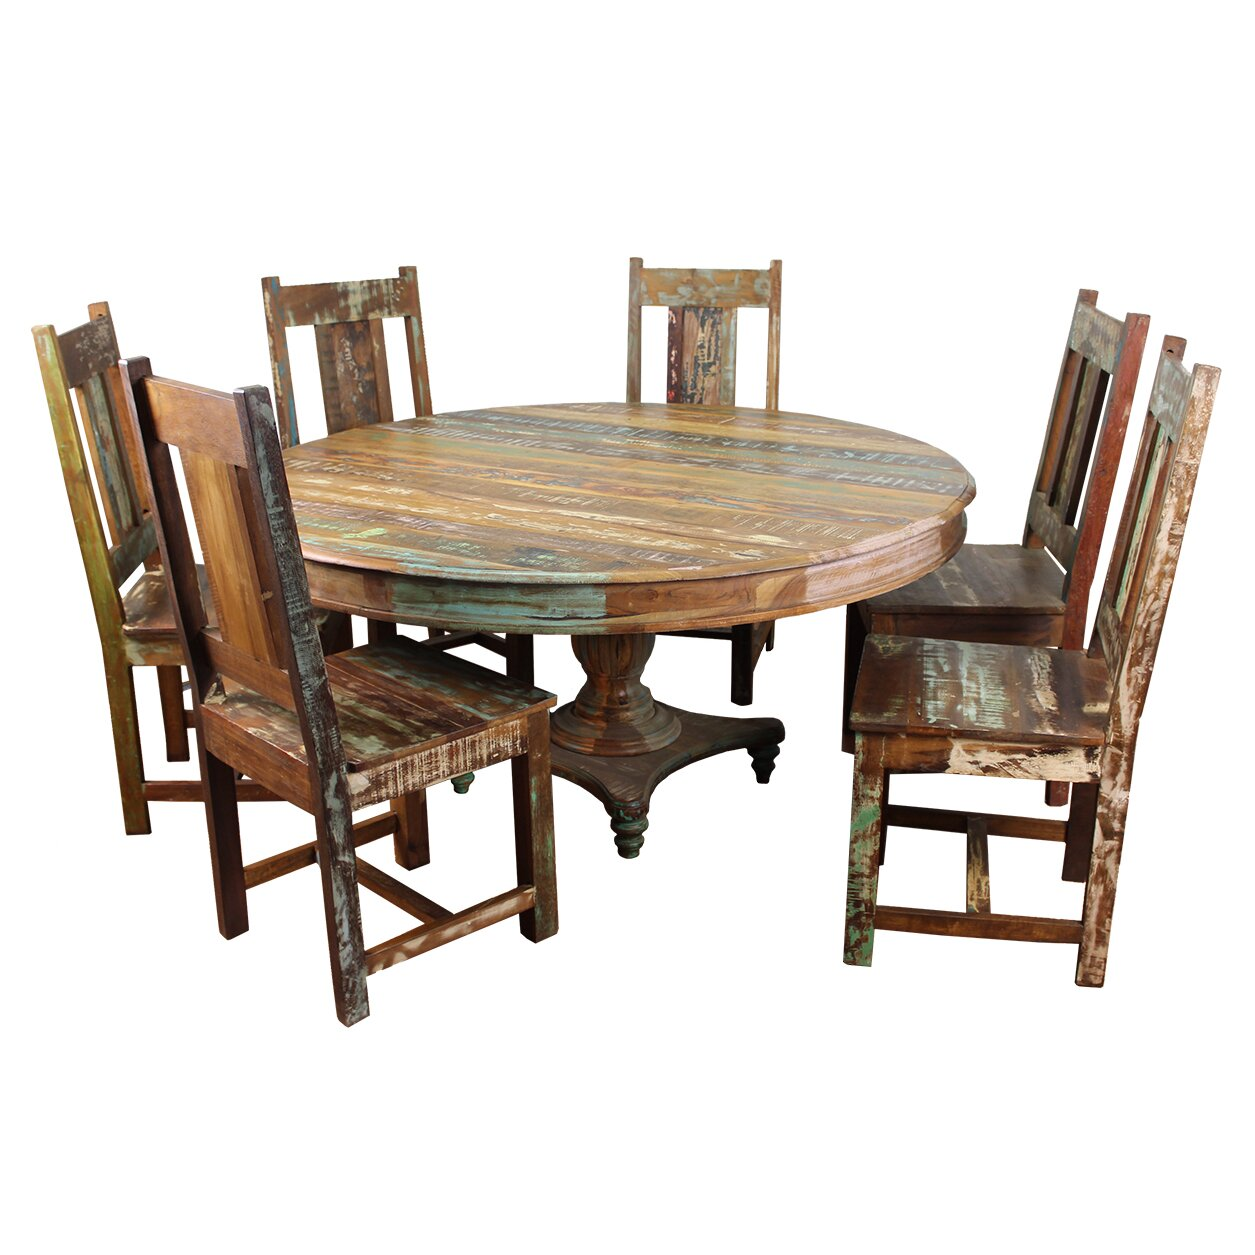 Moti furniture trinidad piece dining set reviews wayfair